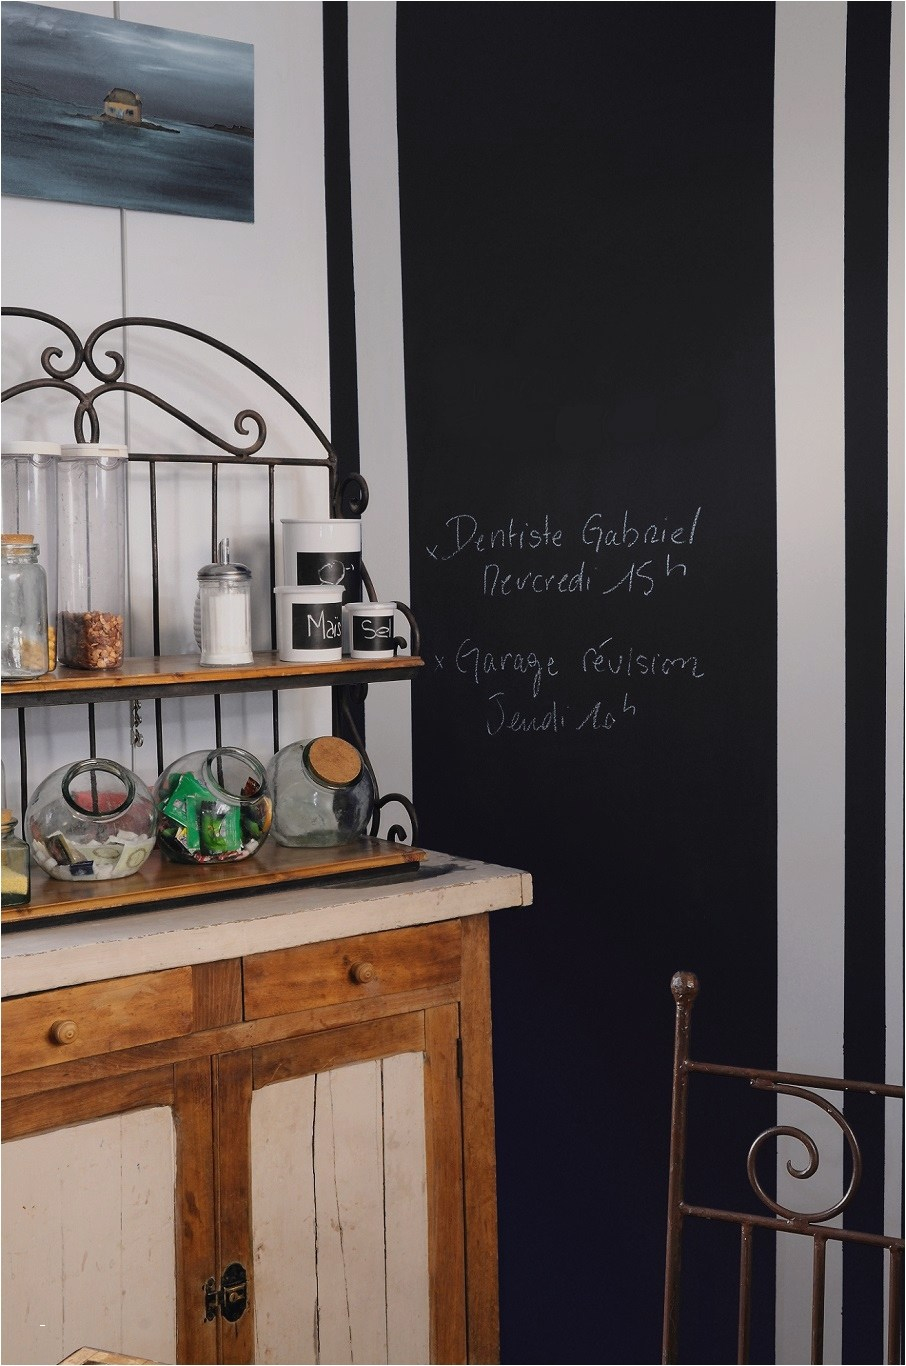 Tableau Cuisine Moderne Inspirant Collection Tableau Cuisine Moderne Inspirant étonné Ardoise Murale Cuisine